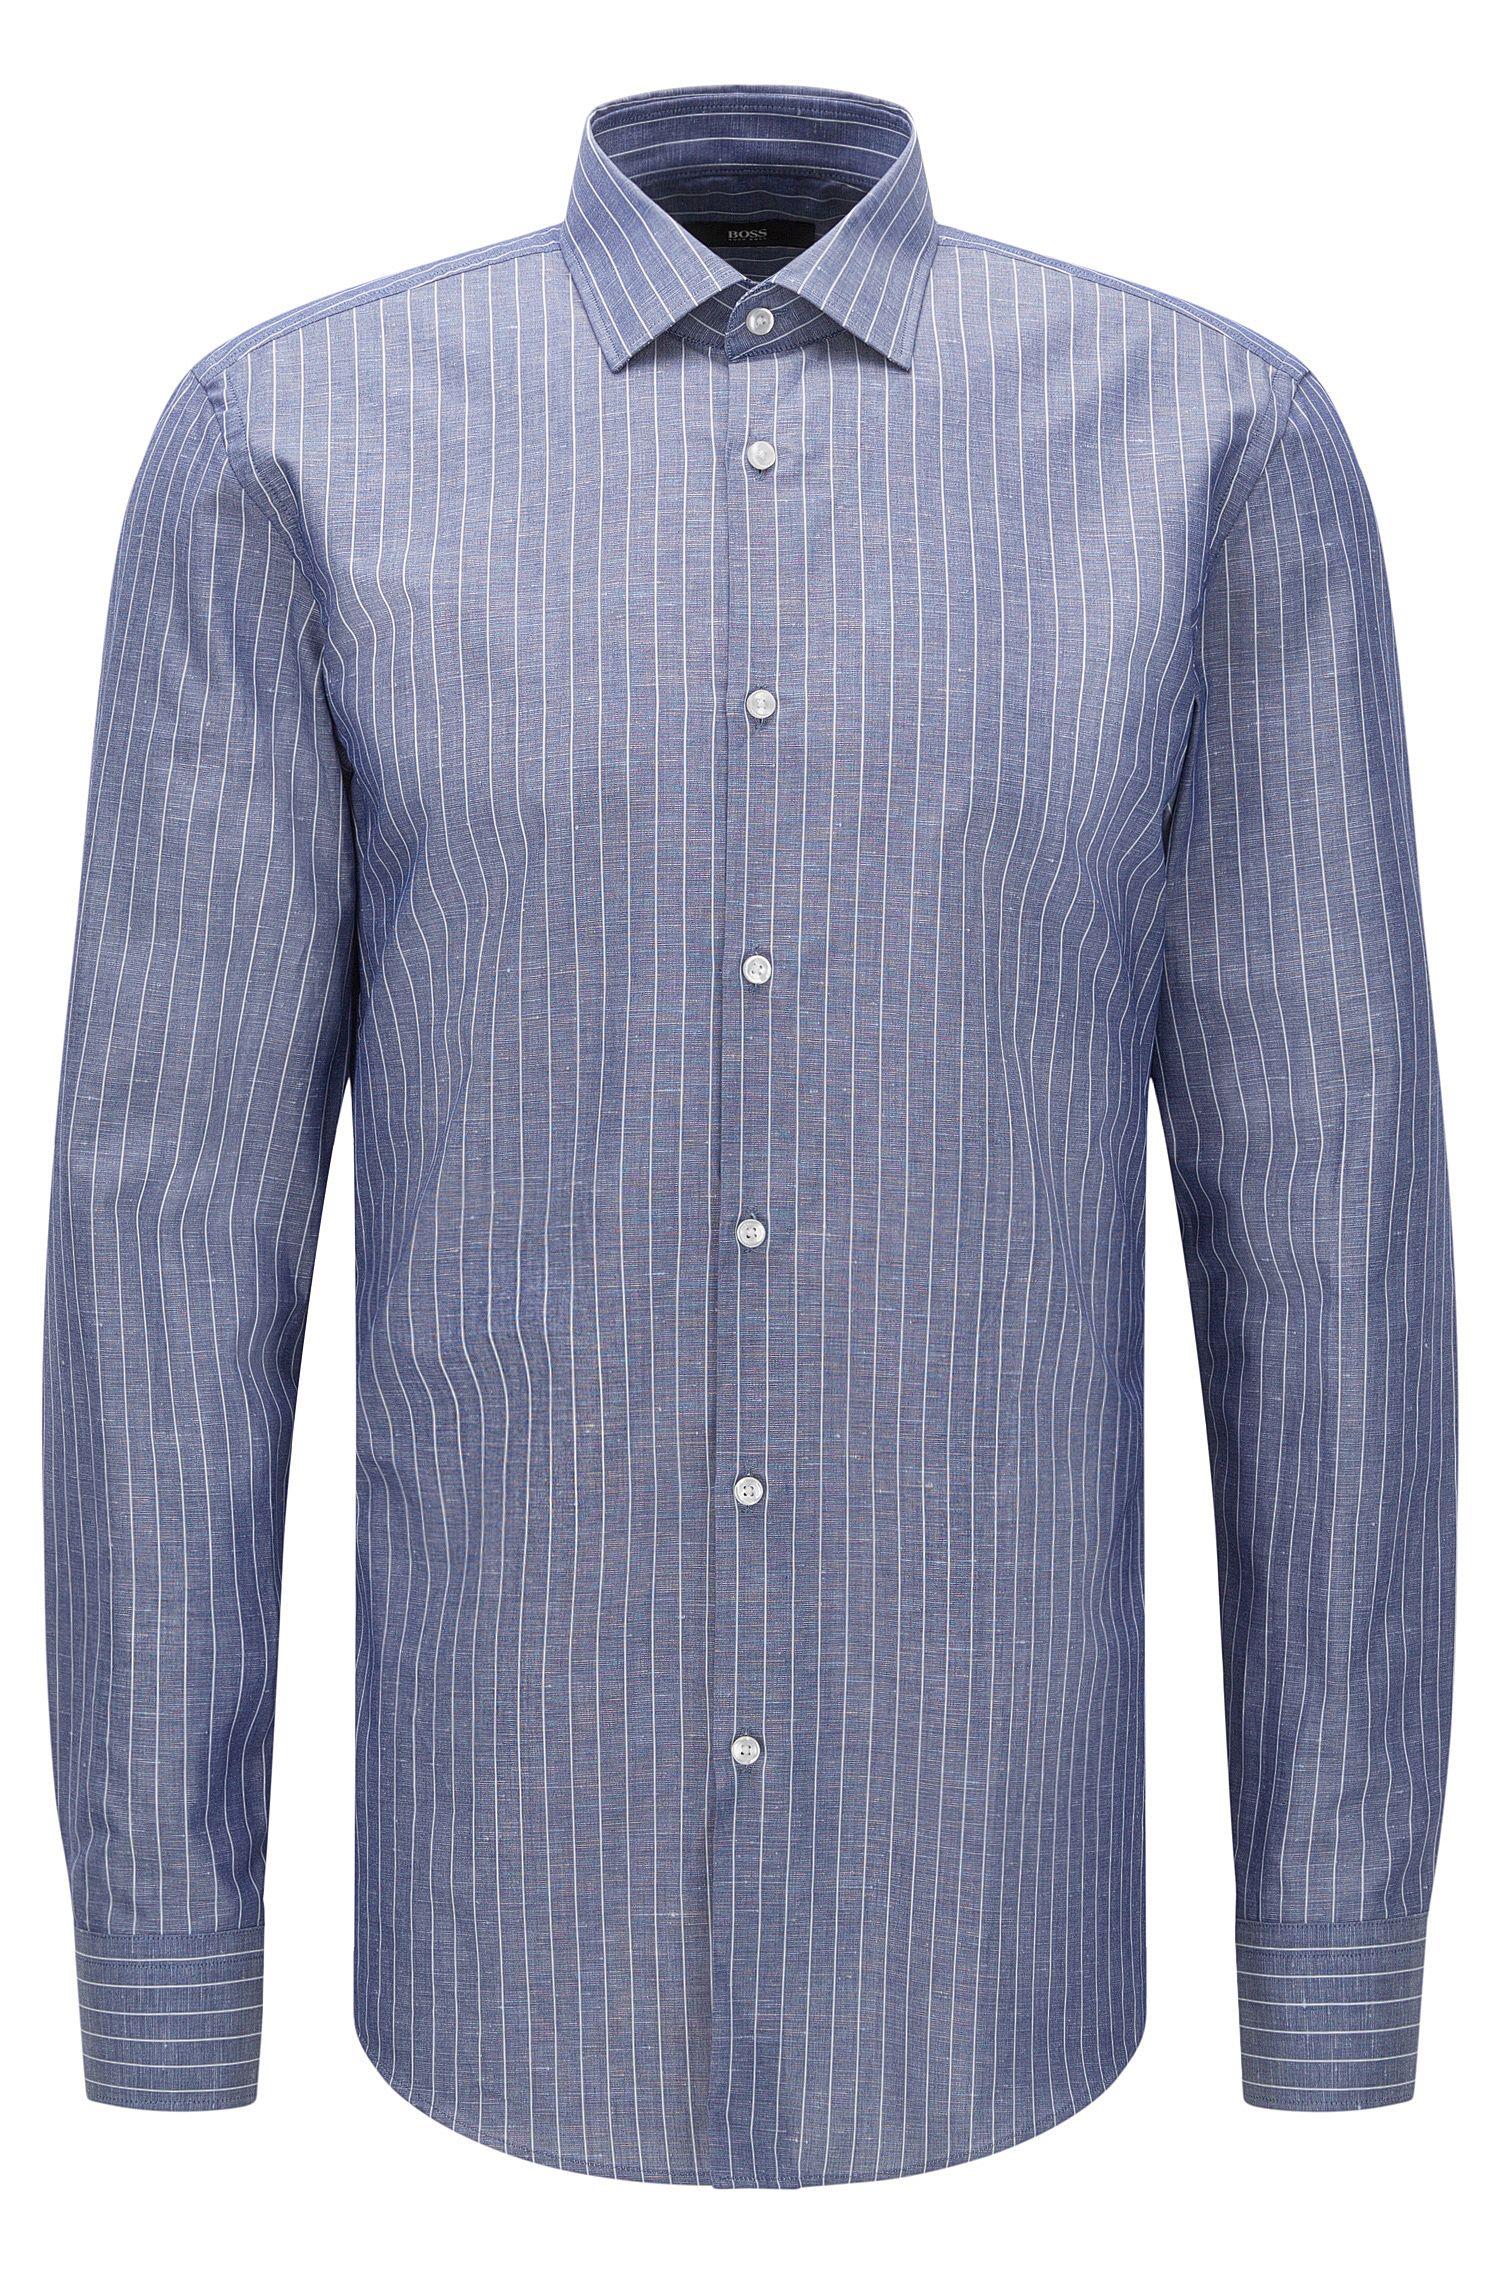 Pinstripe Italian Cotton Linen Dress Shirt, Slim Fit | Jenno